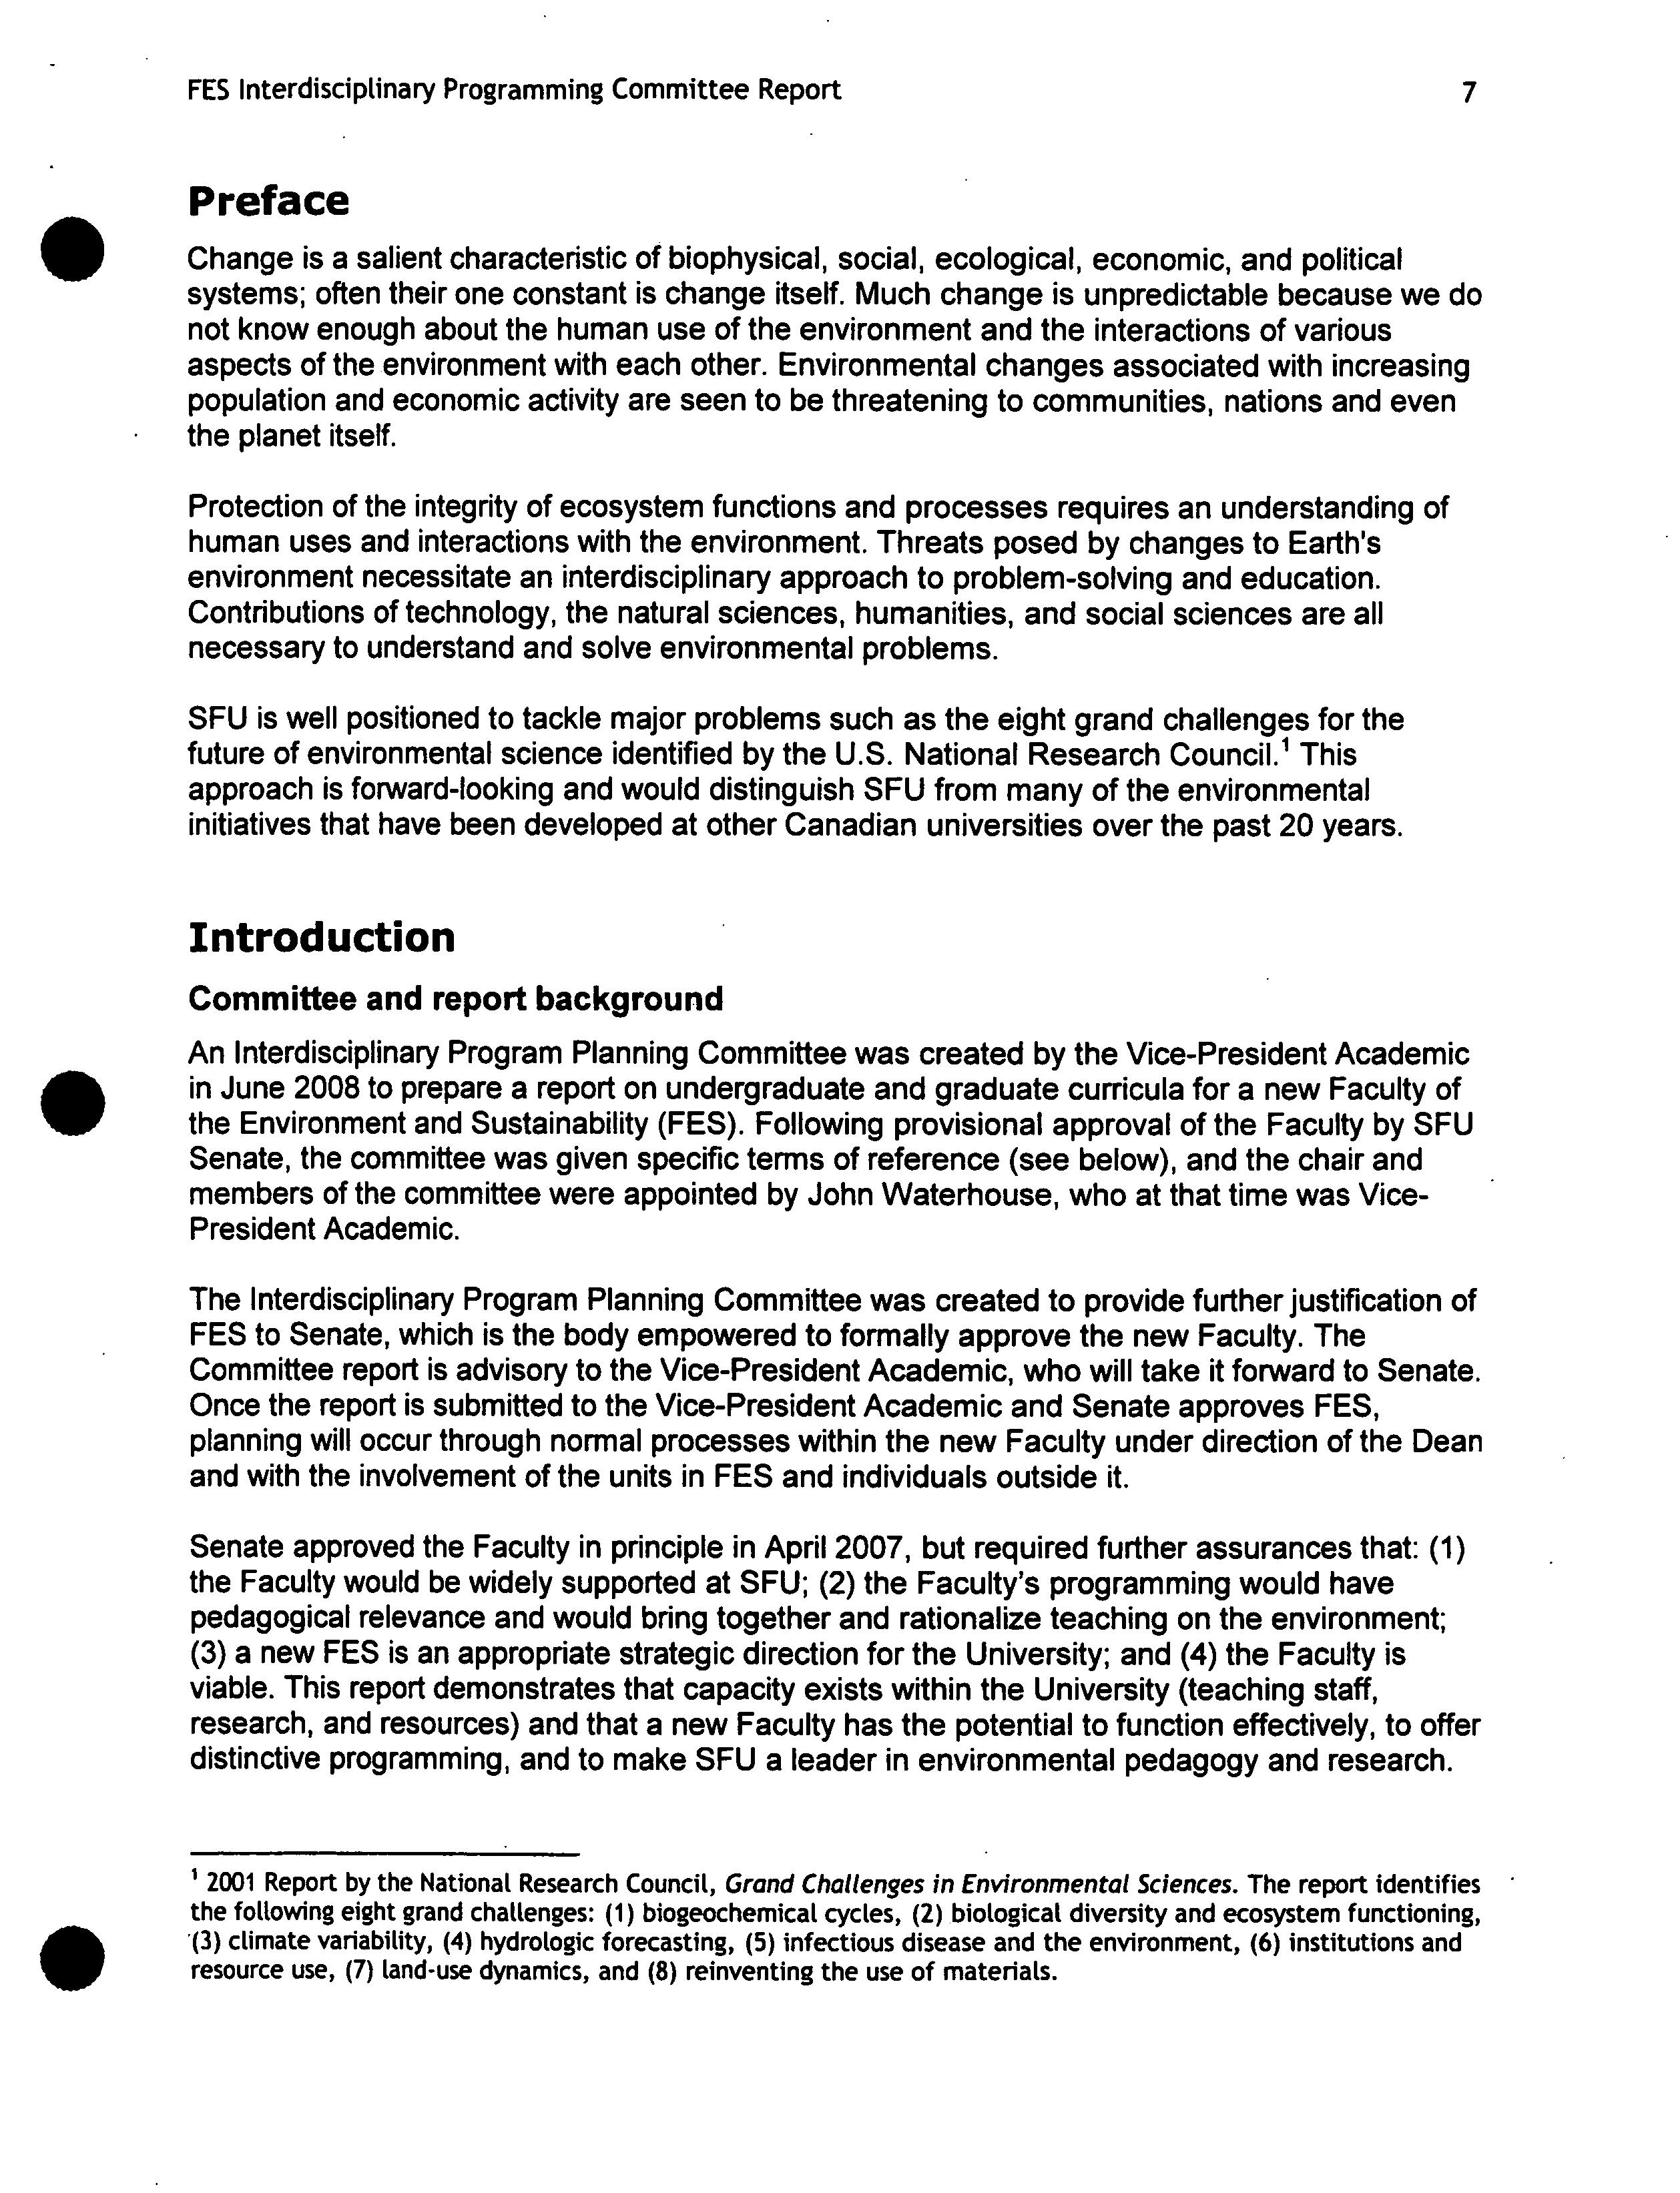 write essay my computer dream house